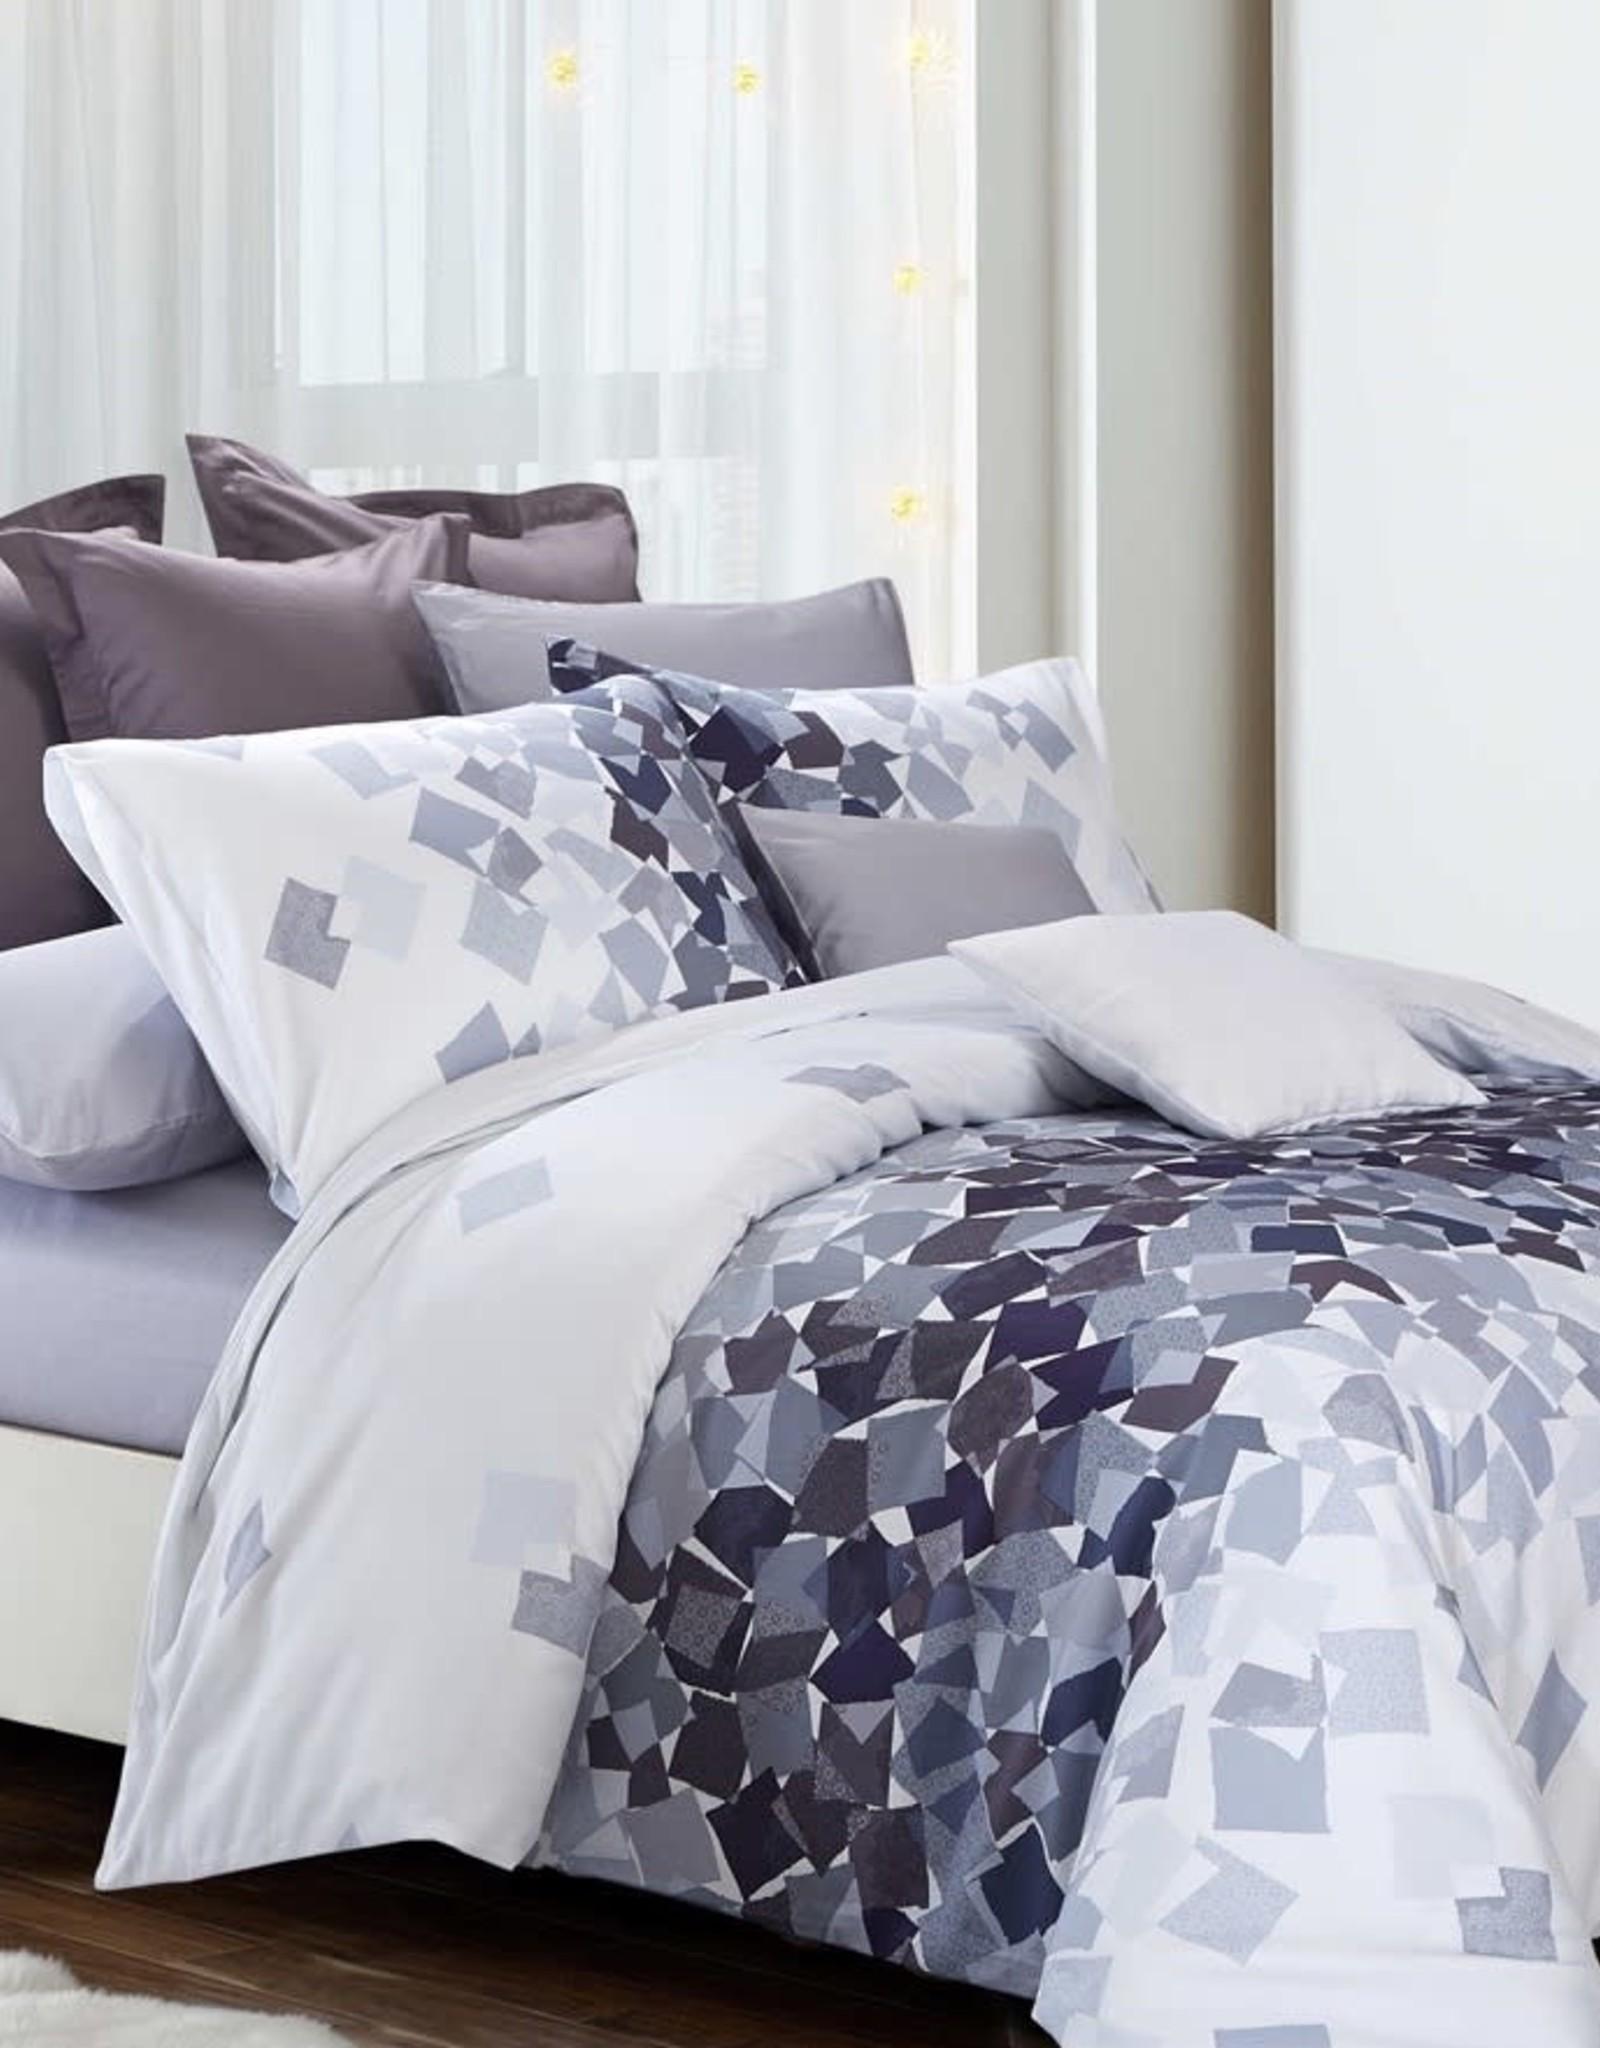 Daniadown Duvet Set Daniadown Mosaic Queen w / Pillow Cases